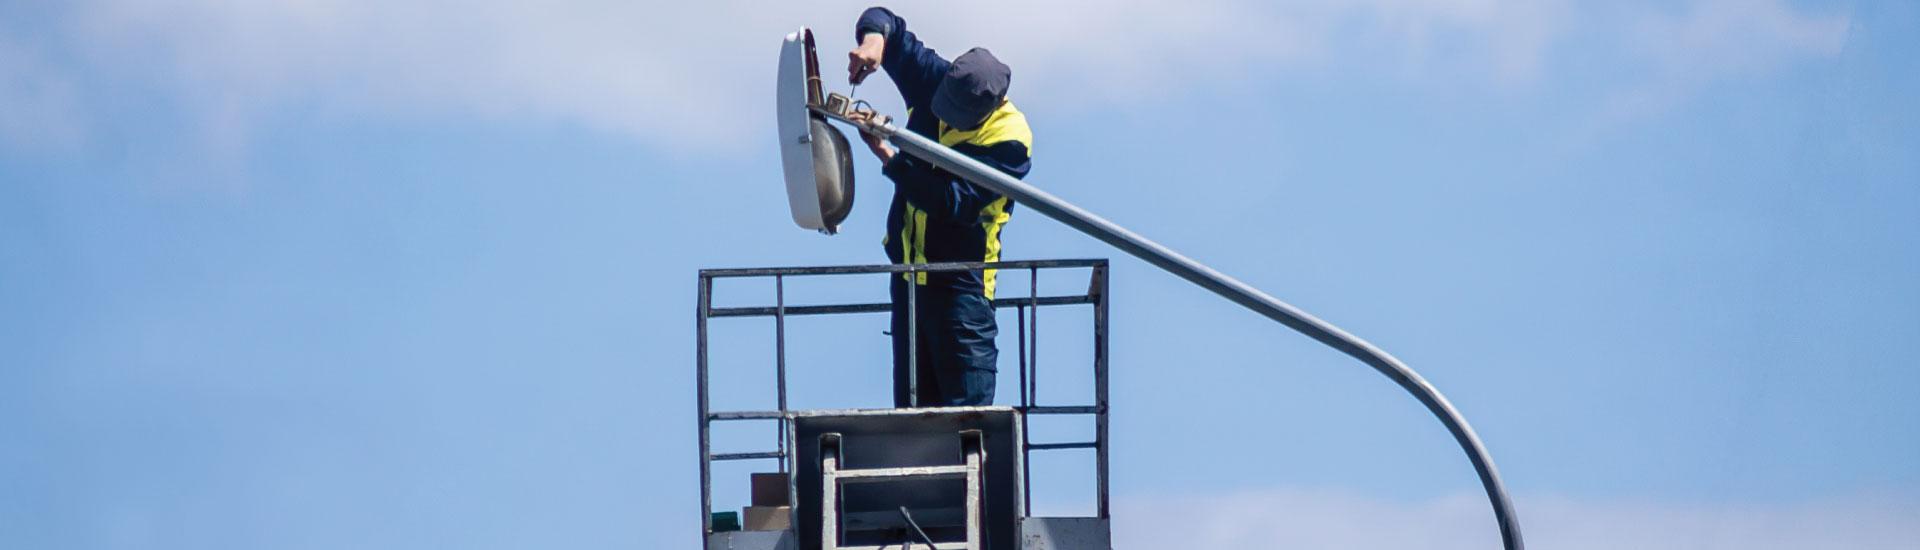 A journeyman electrician repairs a parking lot lighting fixture from a bucket truck